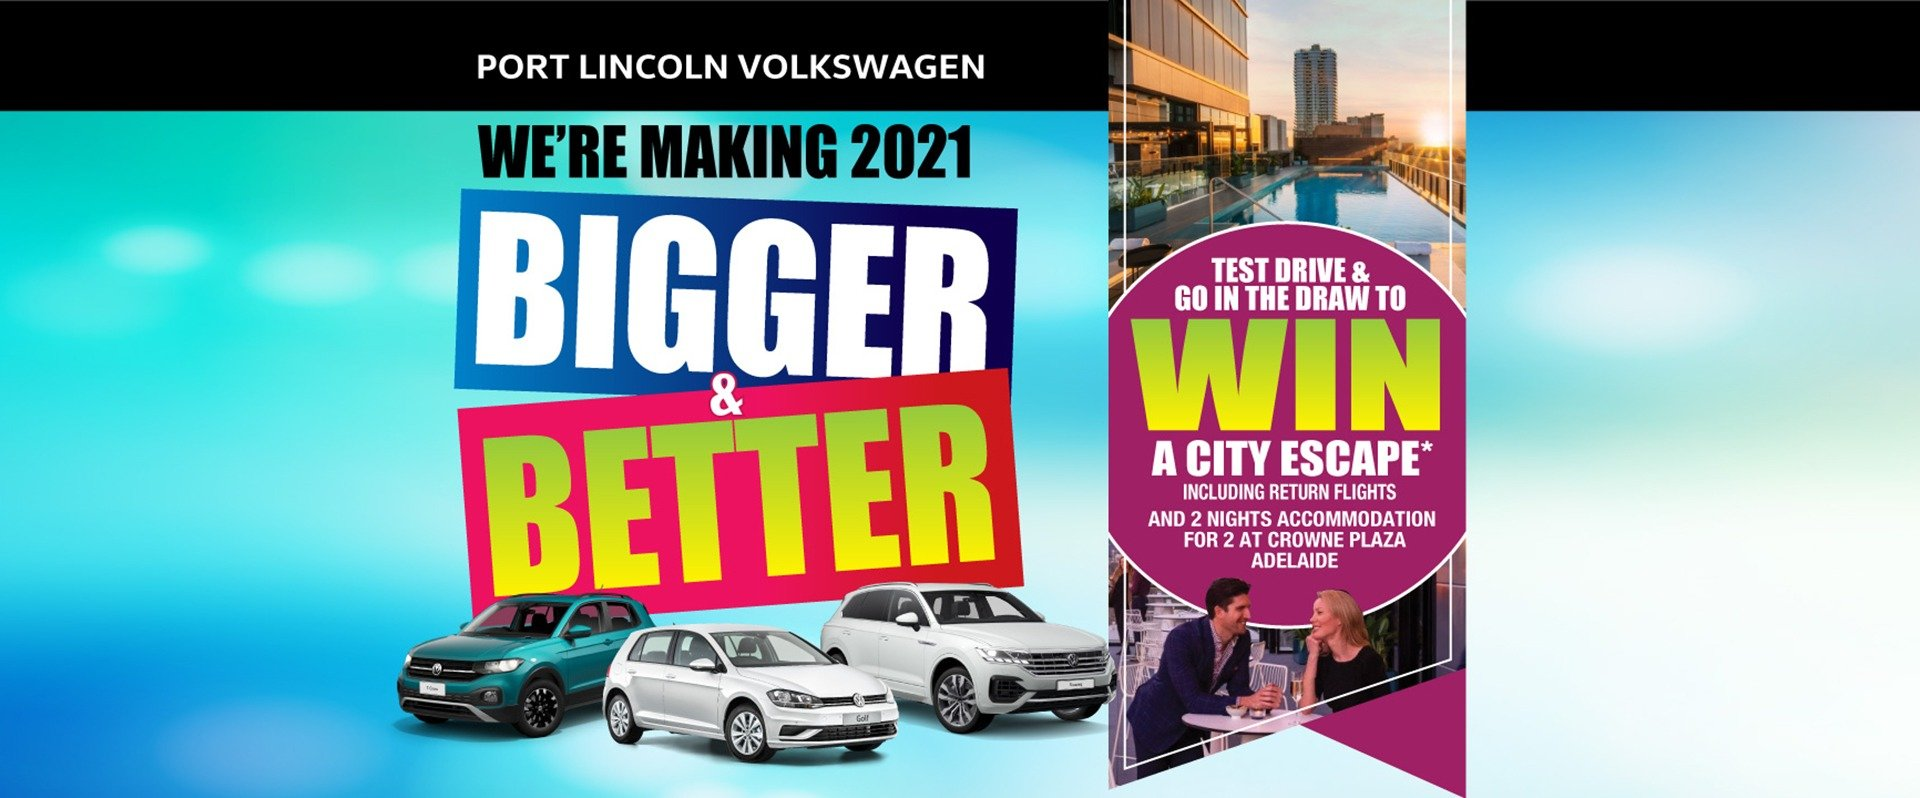 Port Lincoln Volkswagen - Bigger & Better